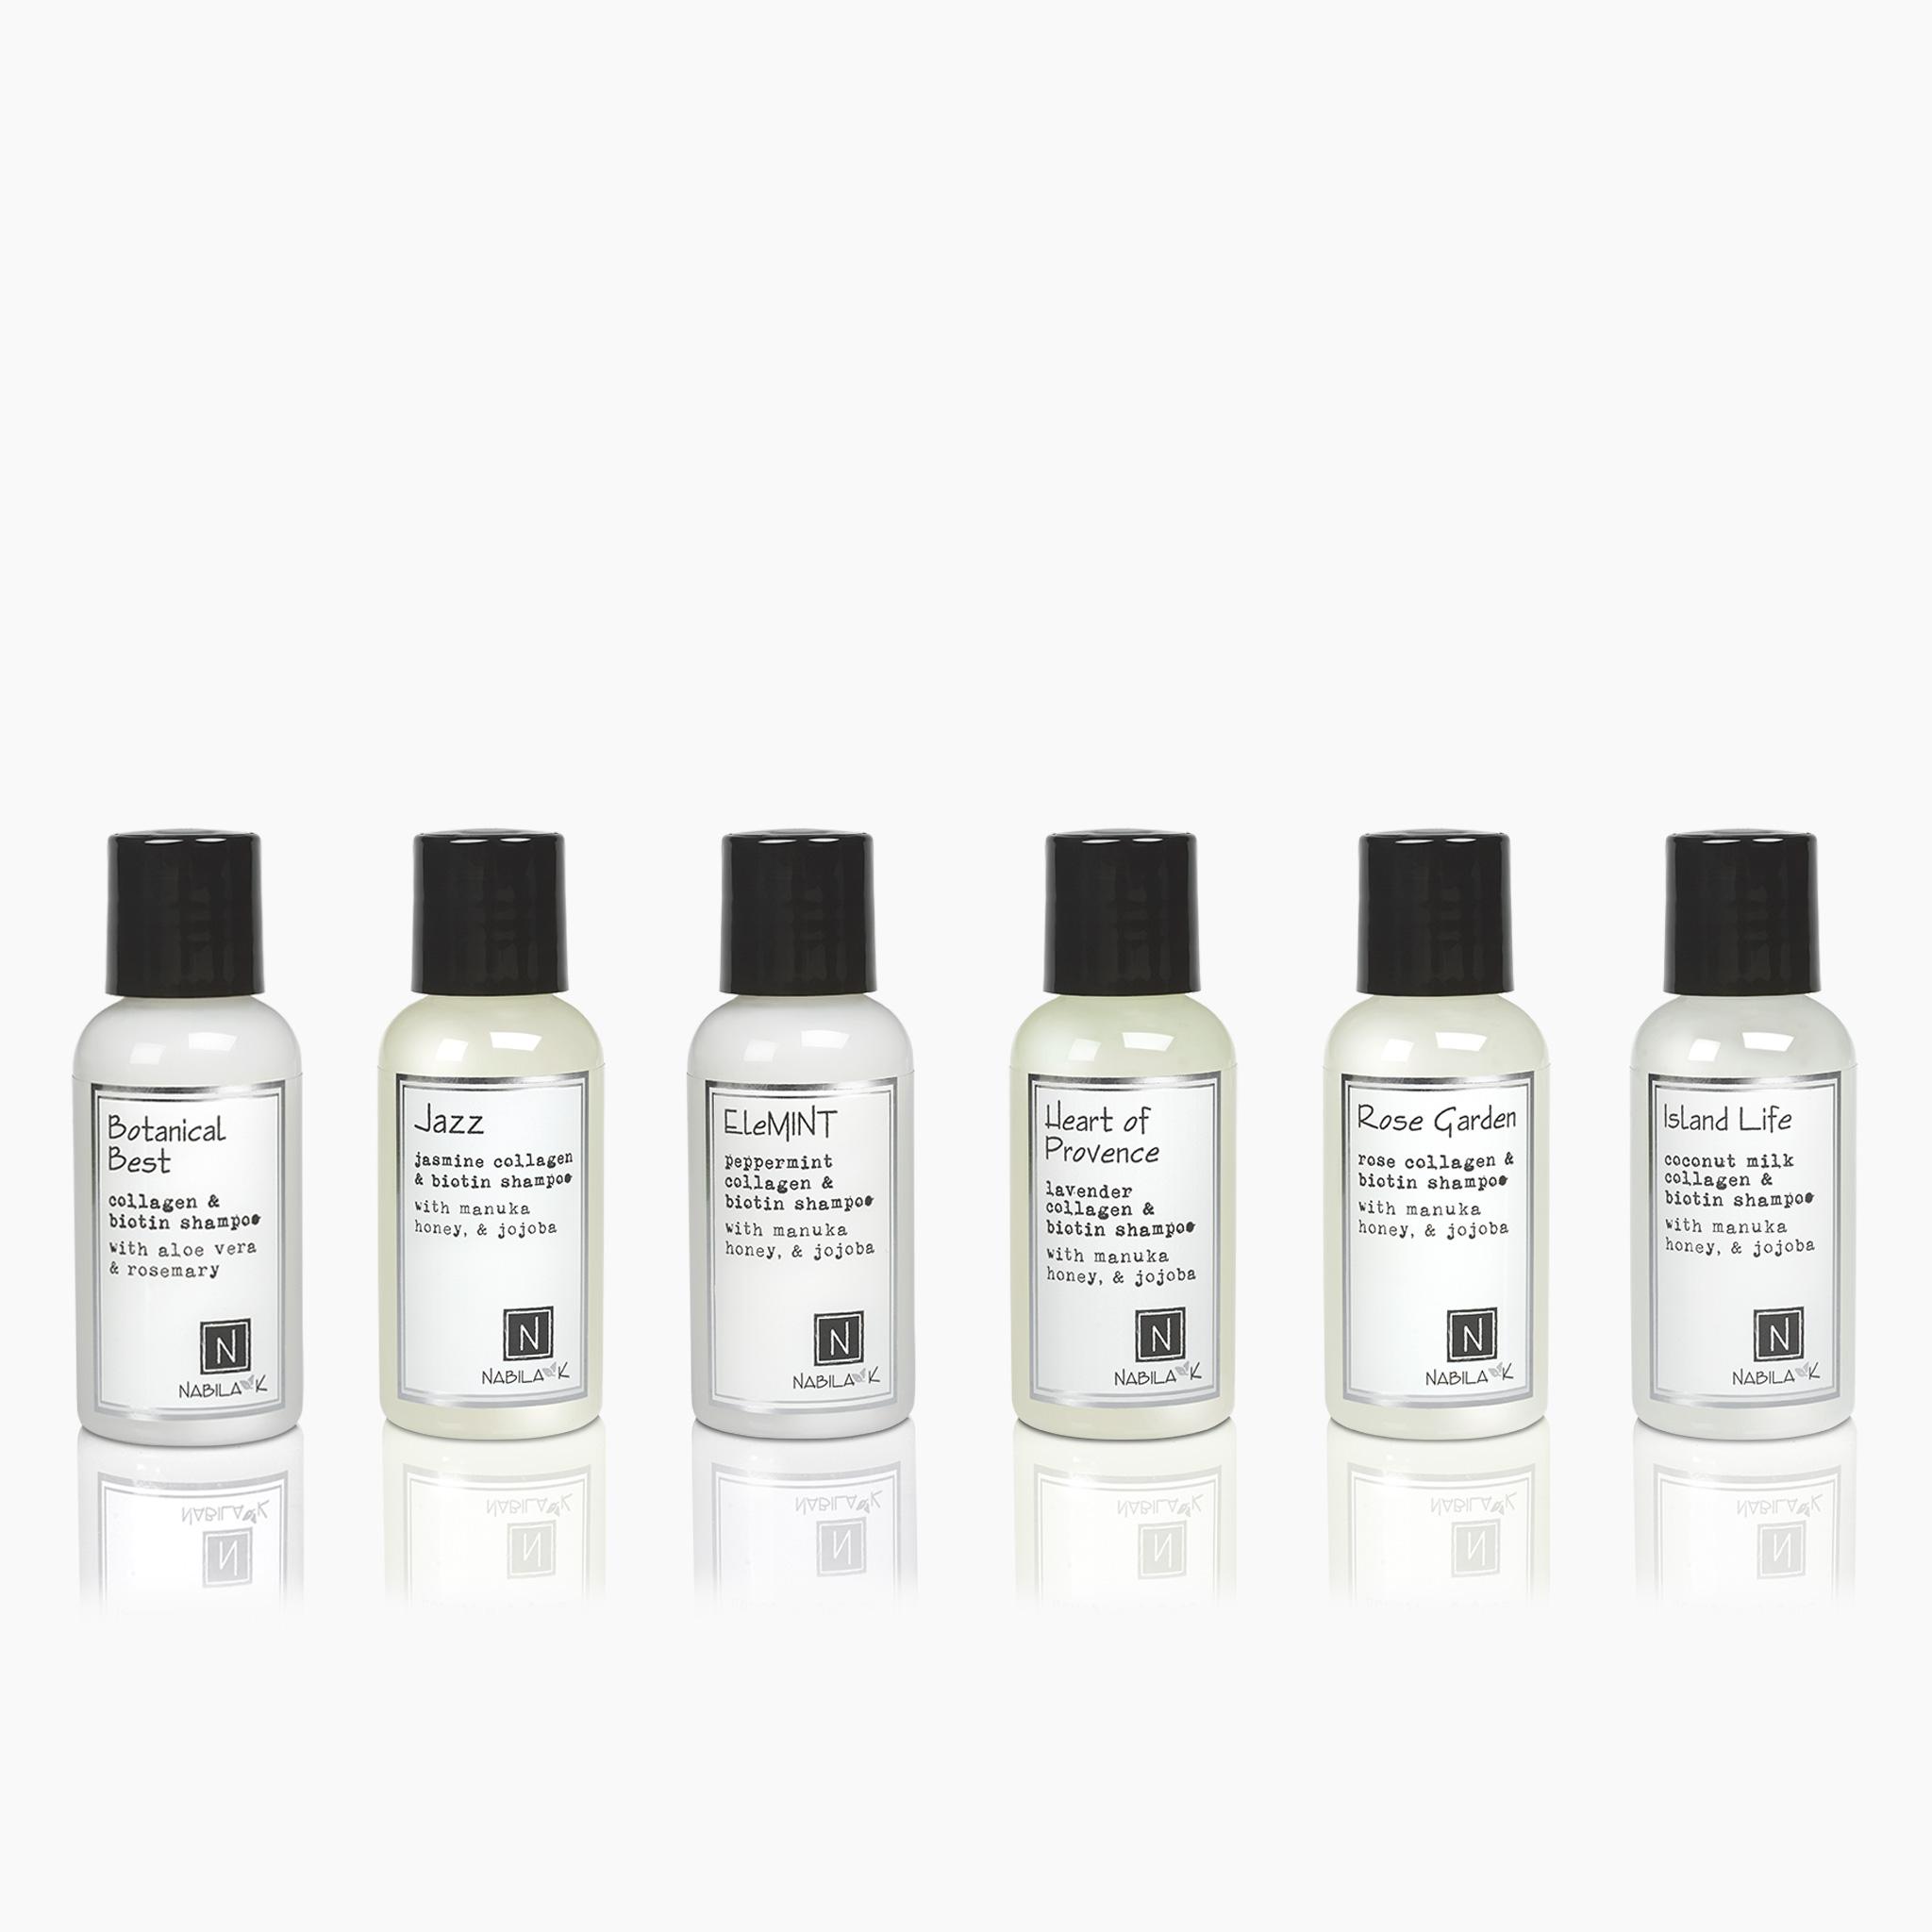 6 Travel Sized Bottles of Nabila K's Collagen and Biotin Shampoo